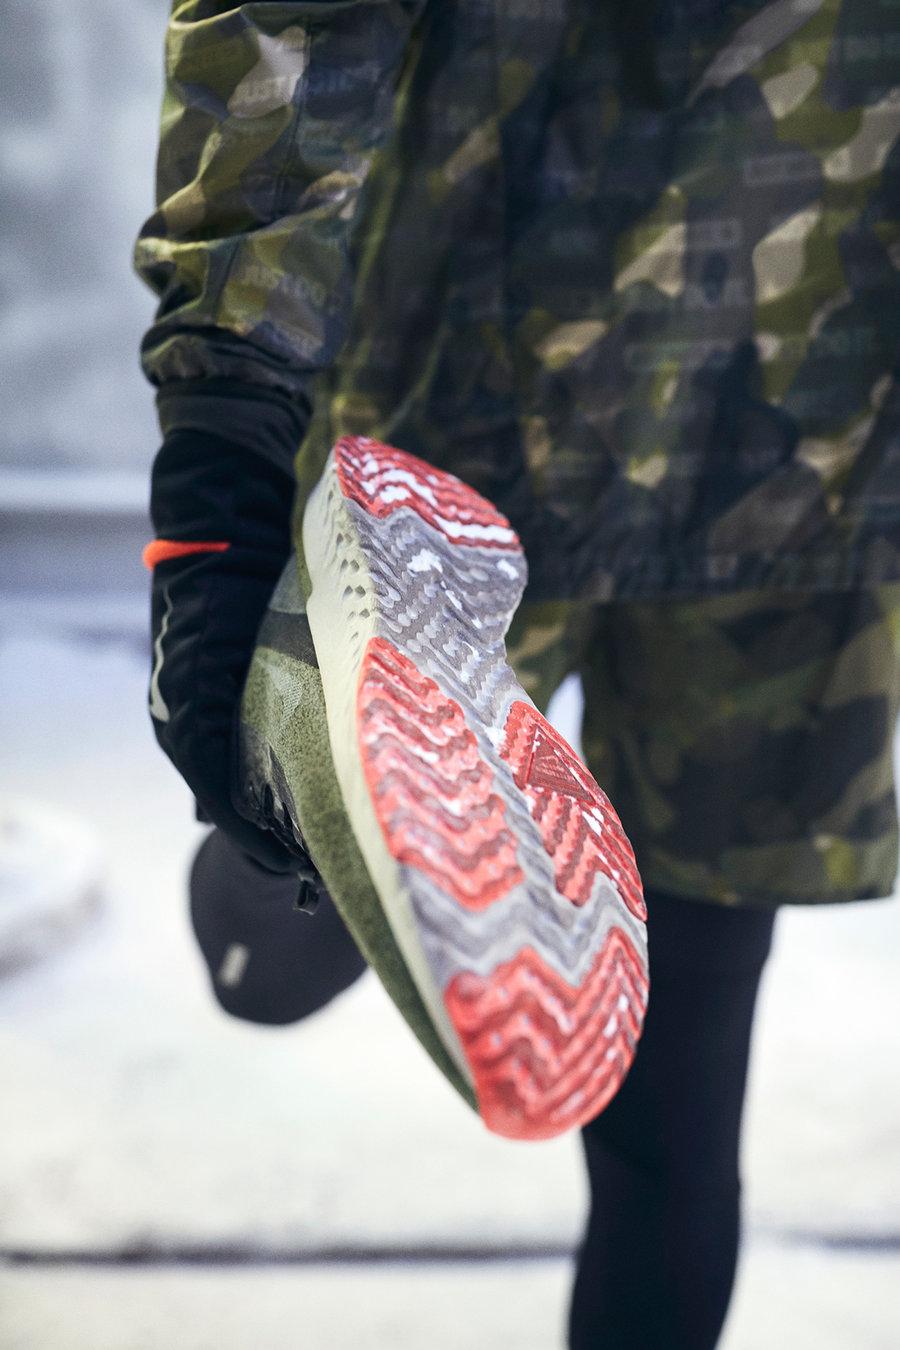 Nike,Running  防水又御寒!Nike 推出冬季跑步鞋款与服饰!